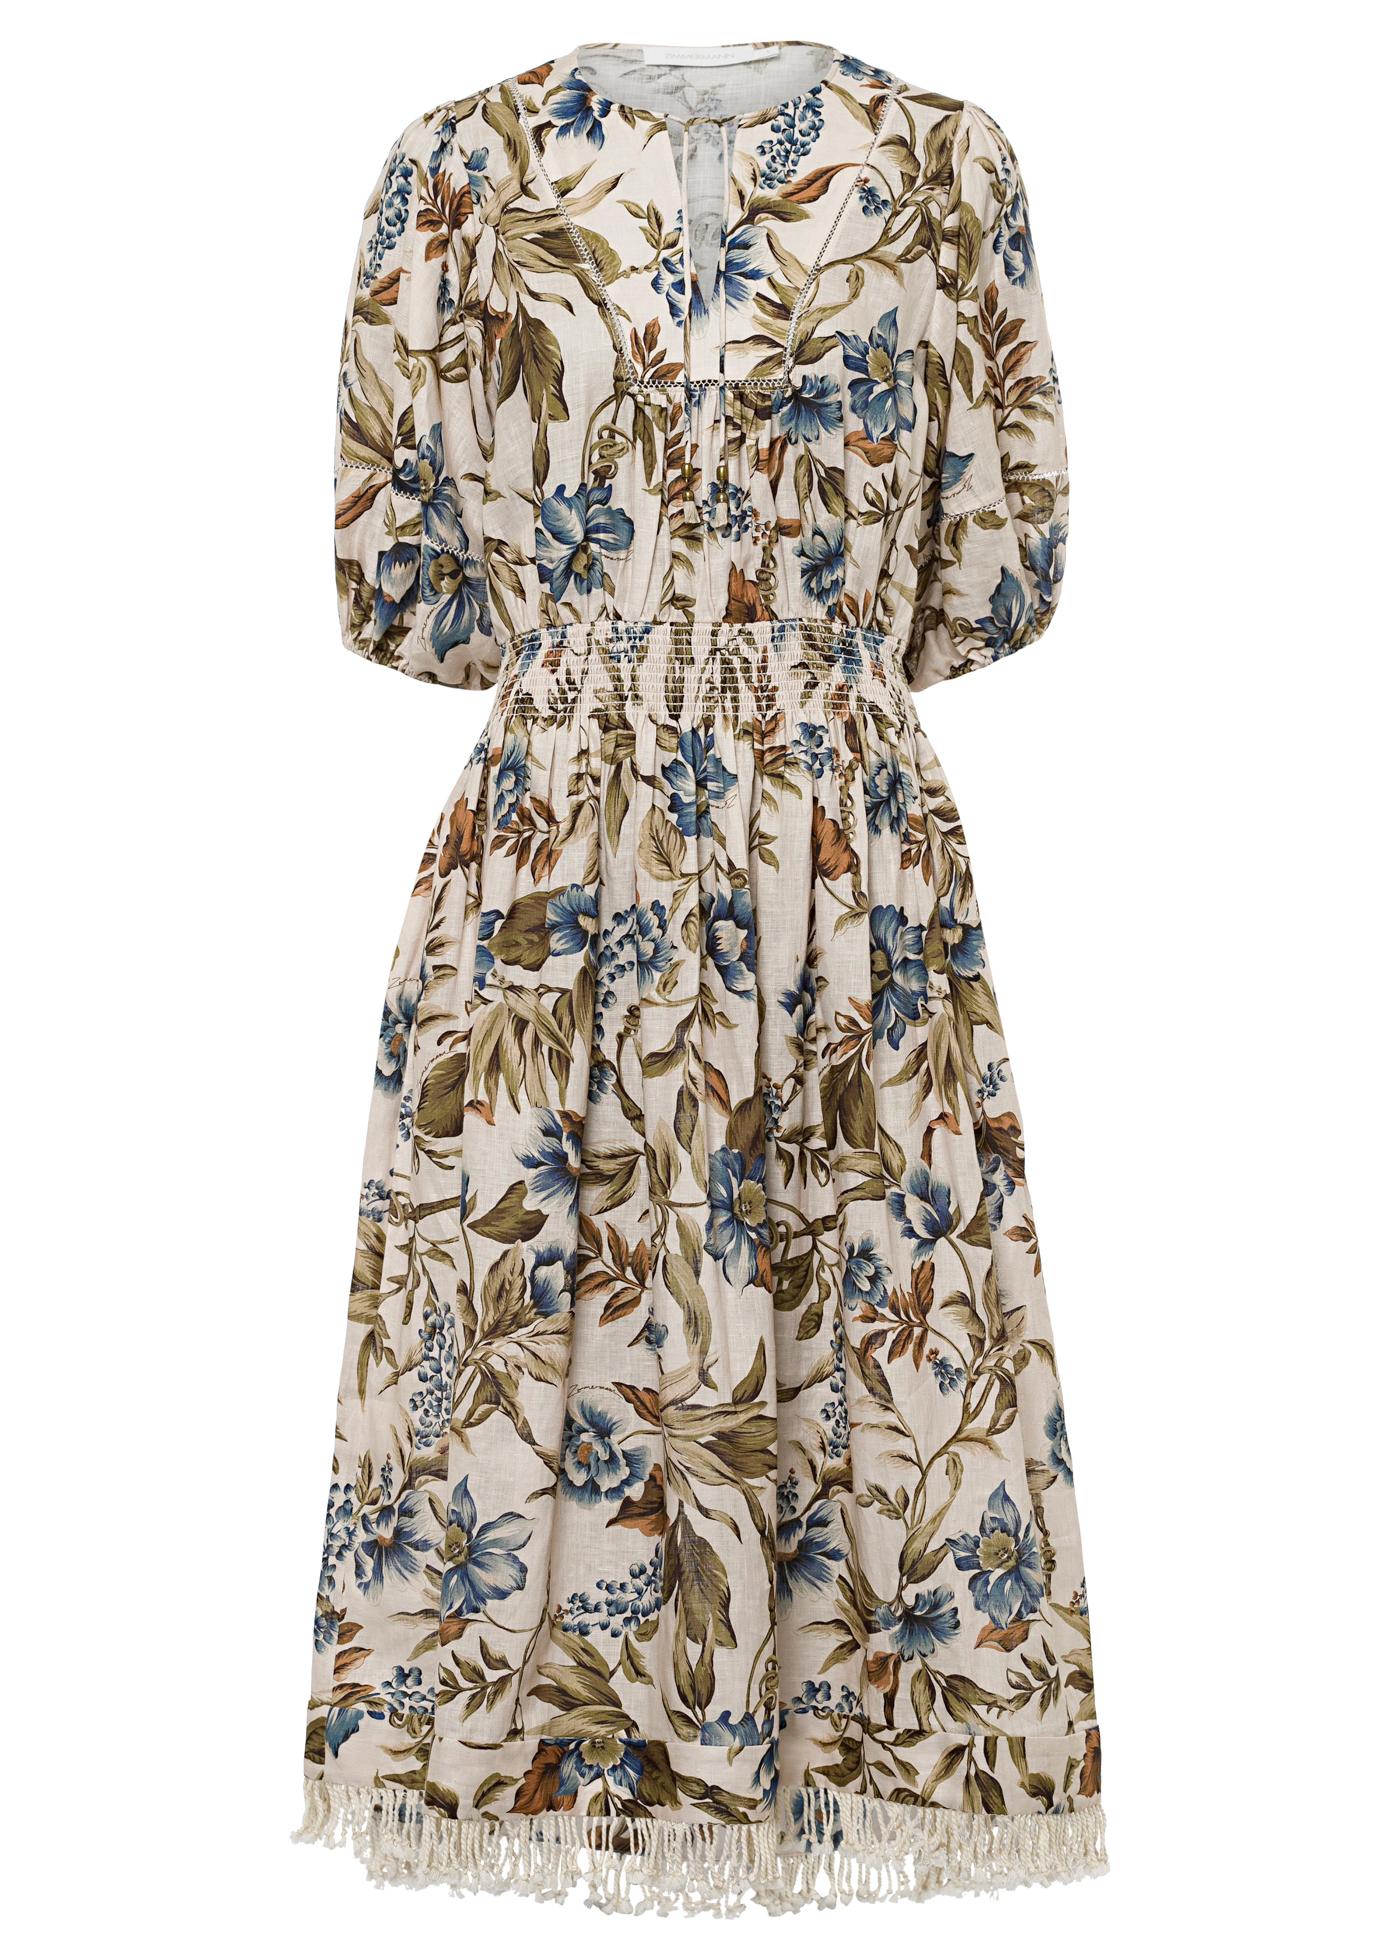 Aliane Shirred Waist Dress image number 0